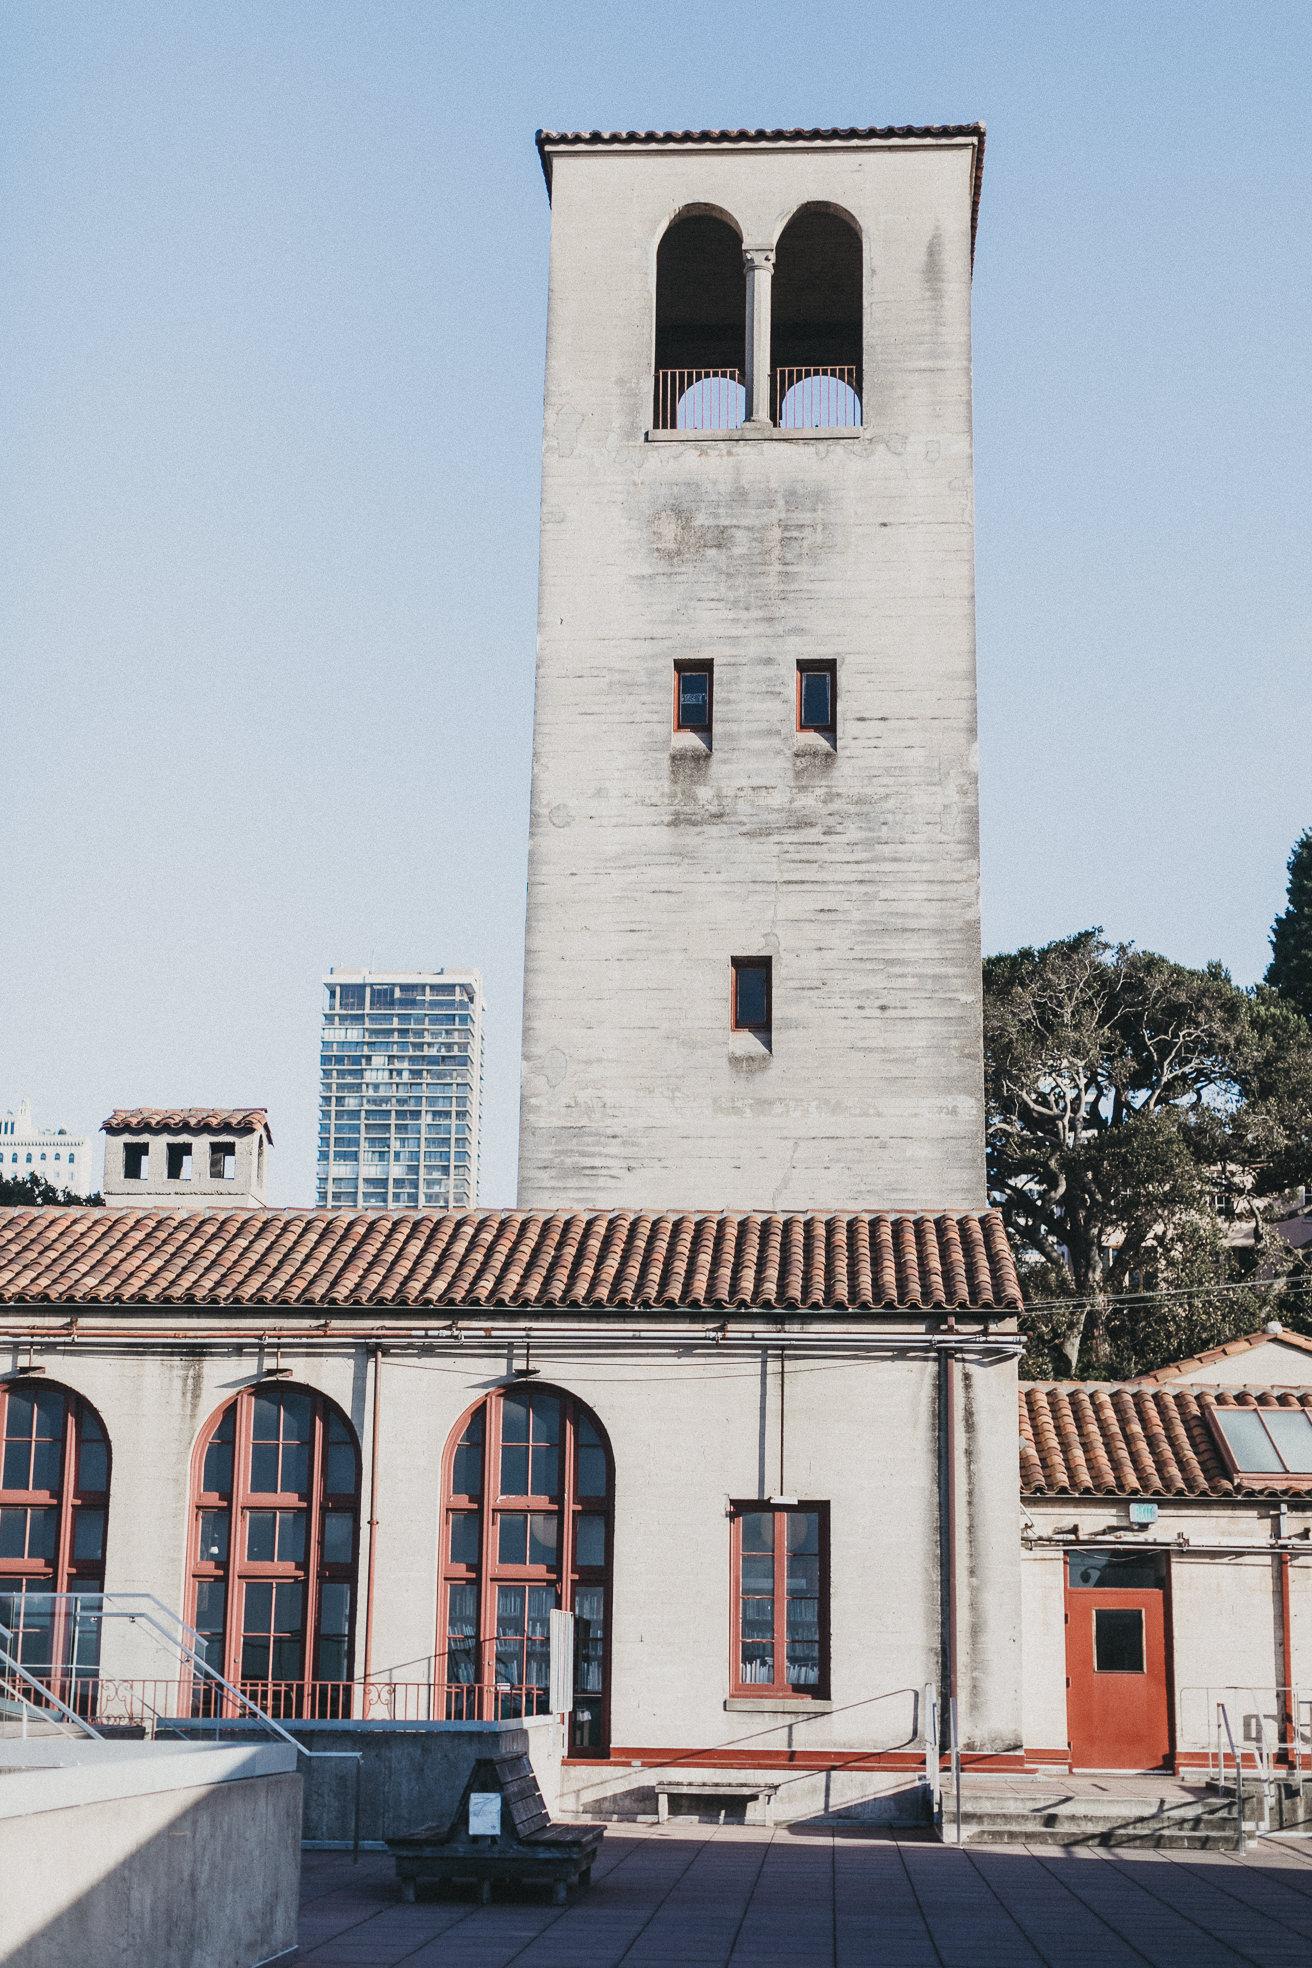 San-Francisco-BildervomLeben-8775